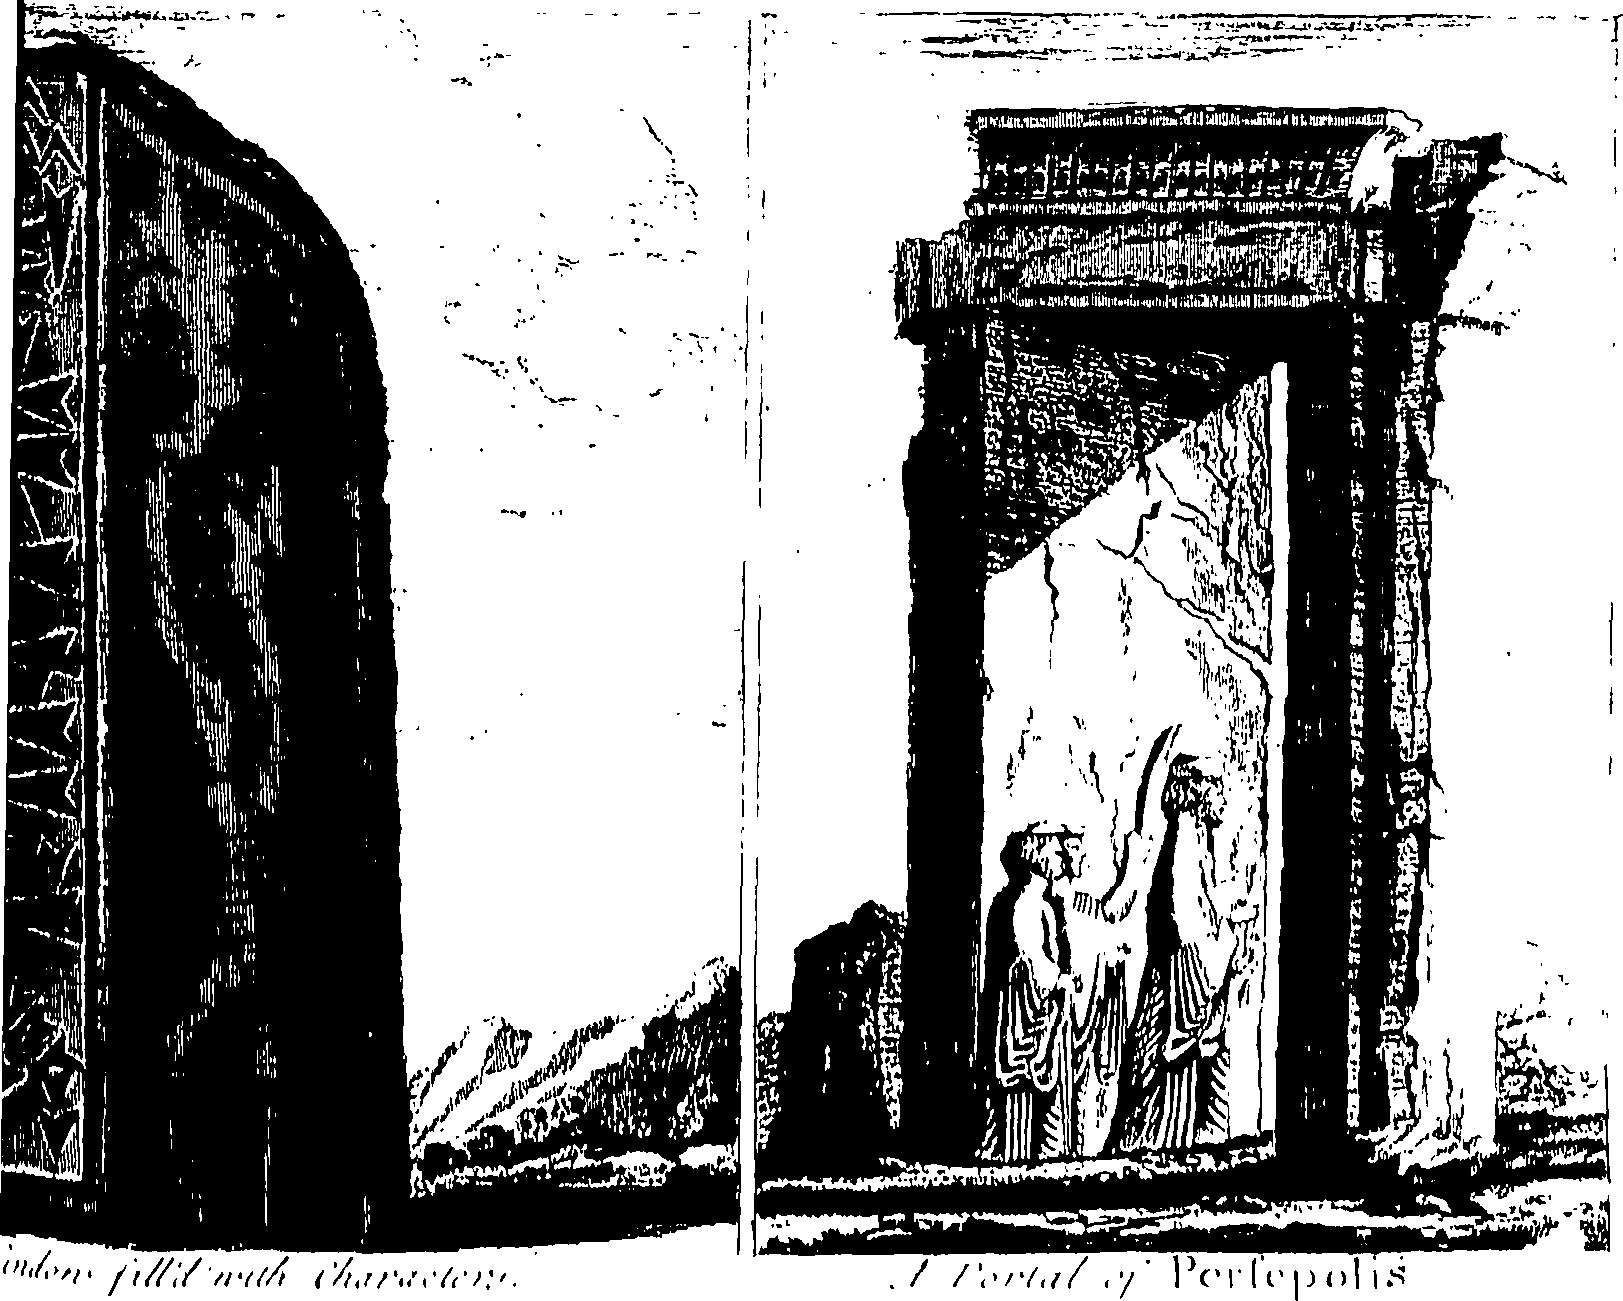 File Persepolis Illustrata Or Fleuron T114392 19 Png Wikimedia Commons